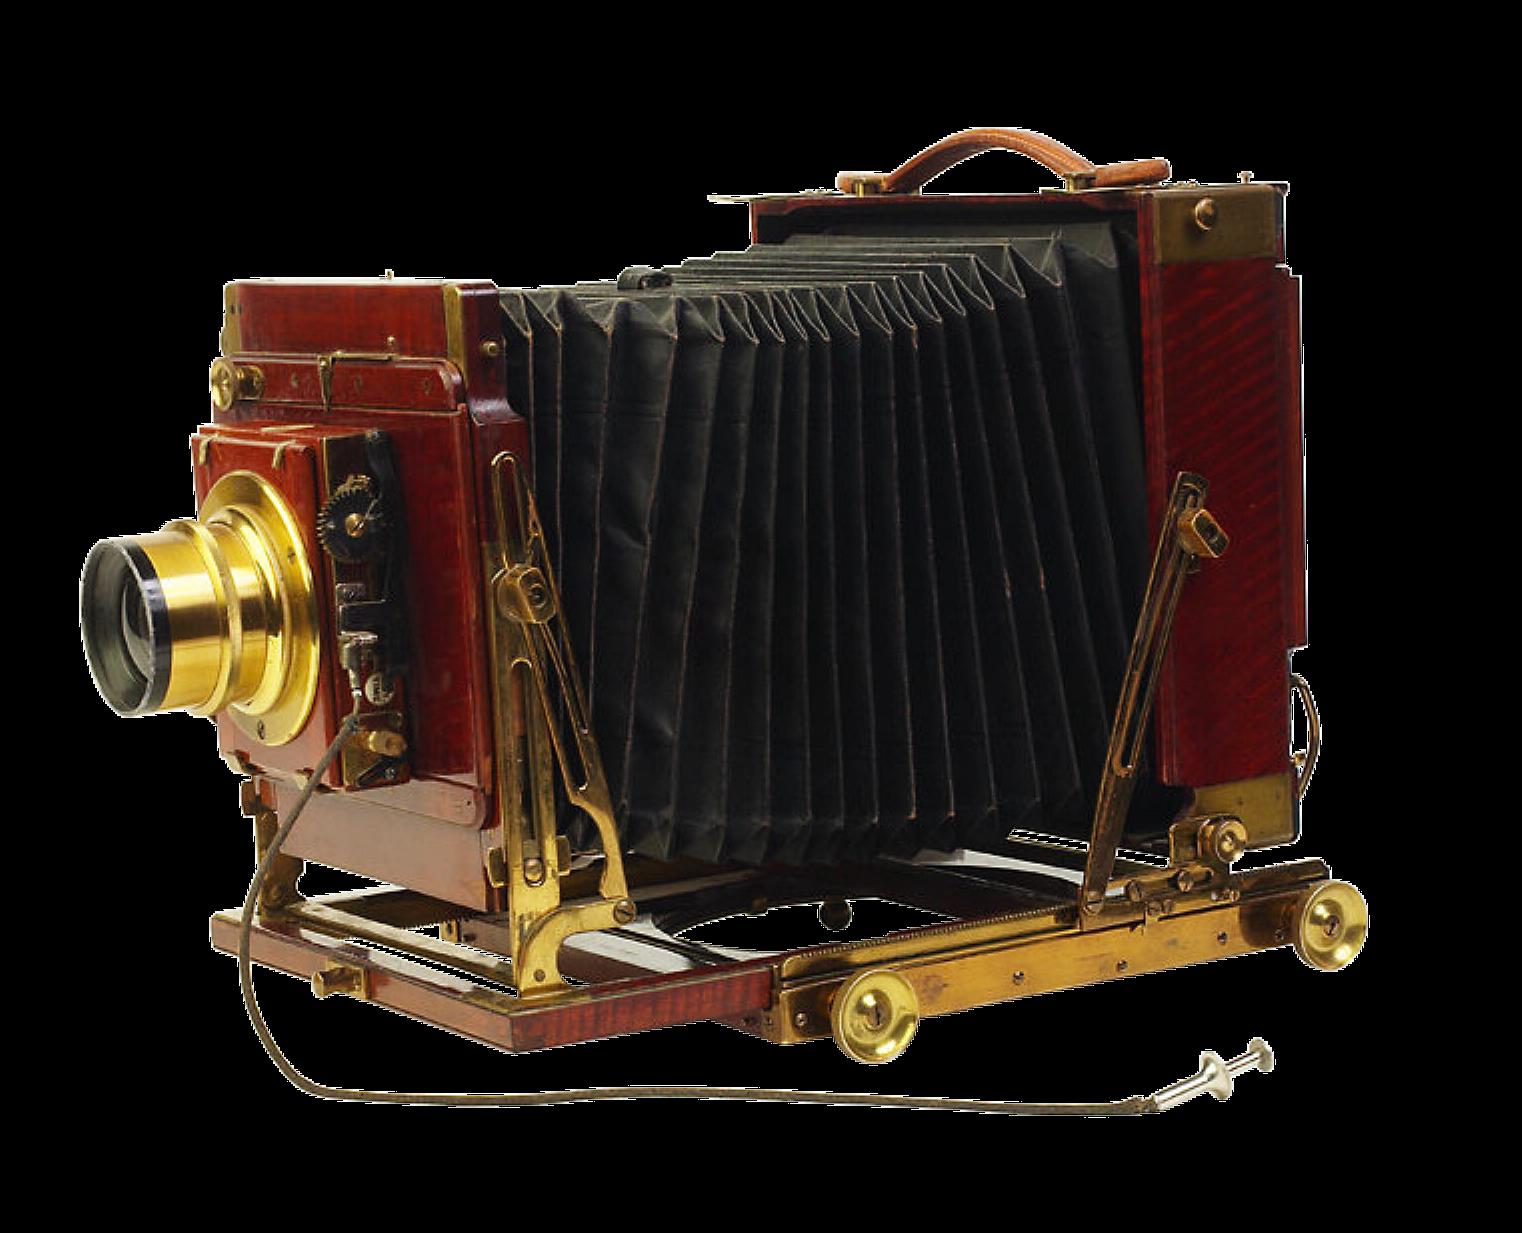 old-camera-2878634